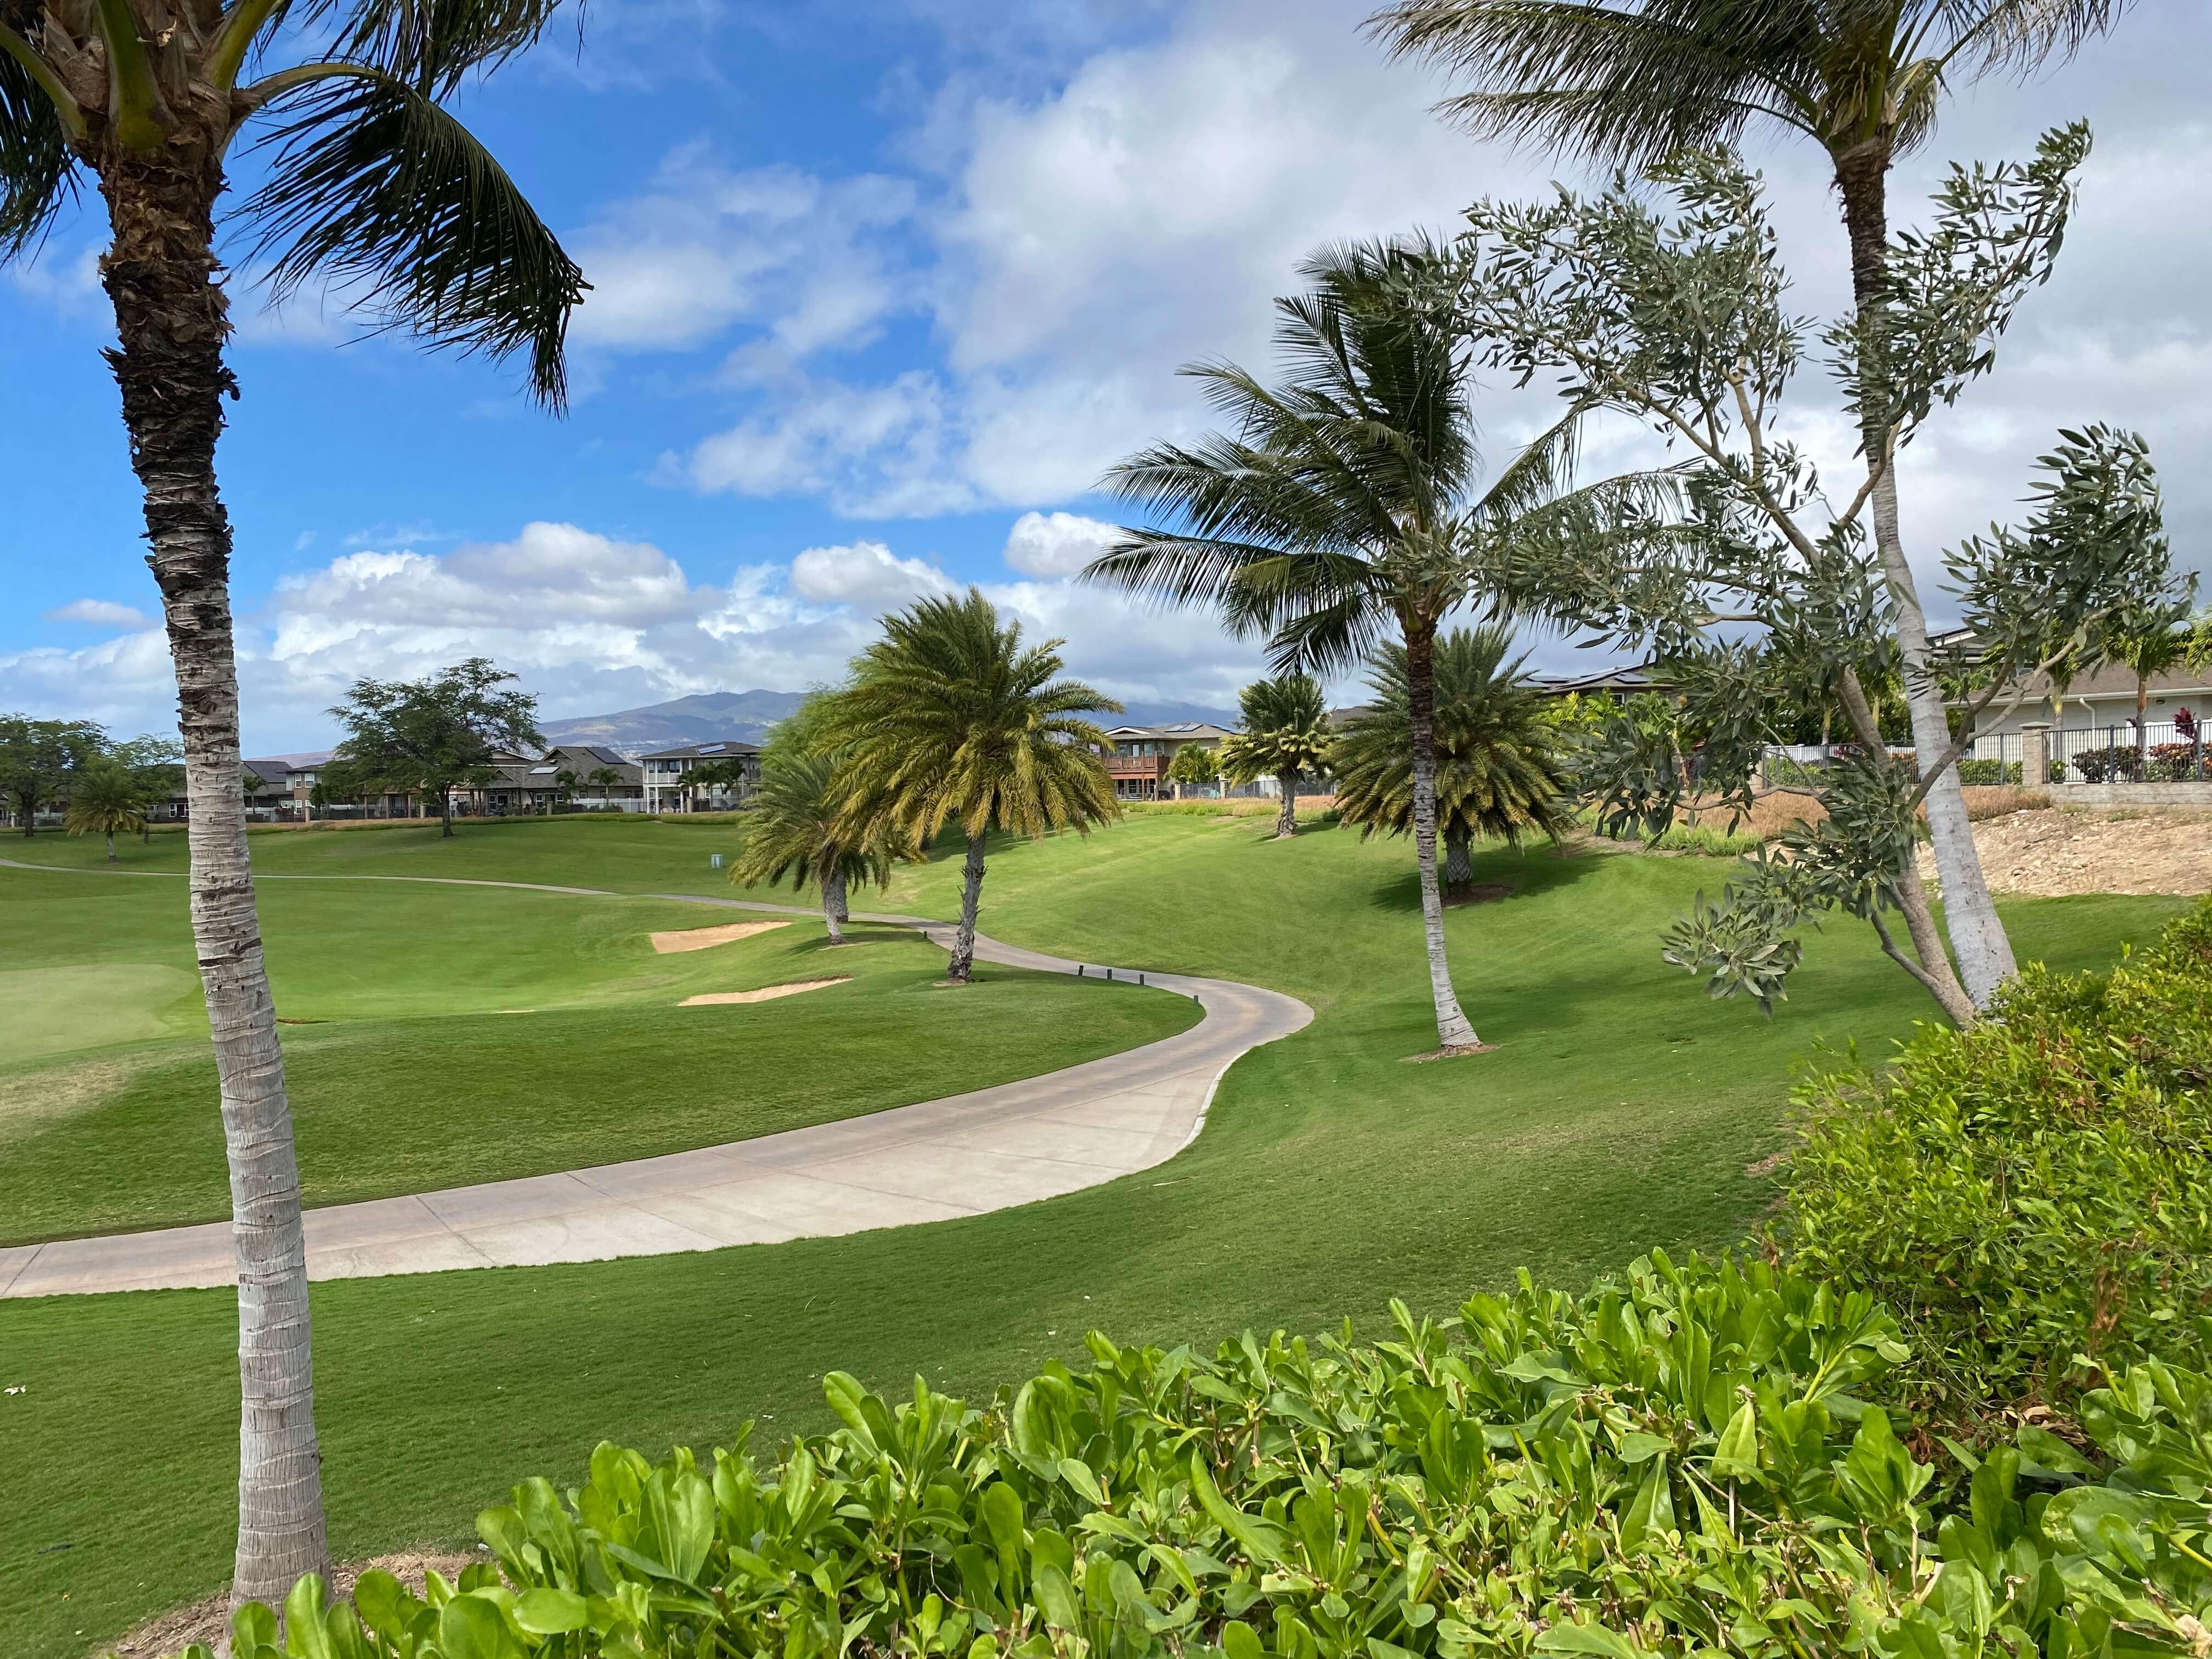 hoakalei resort golf course